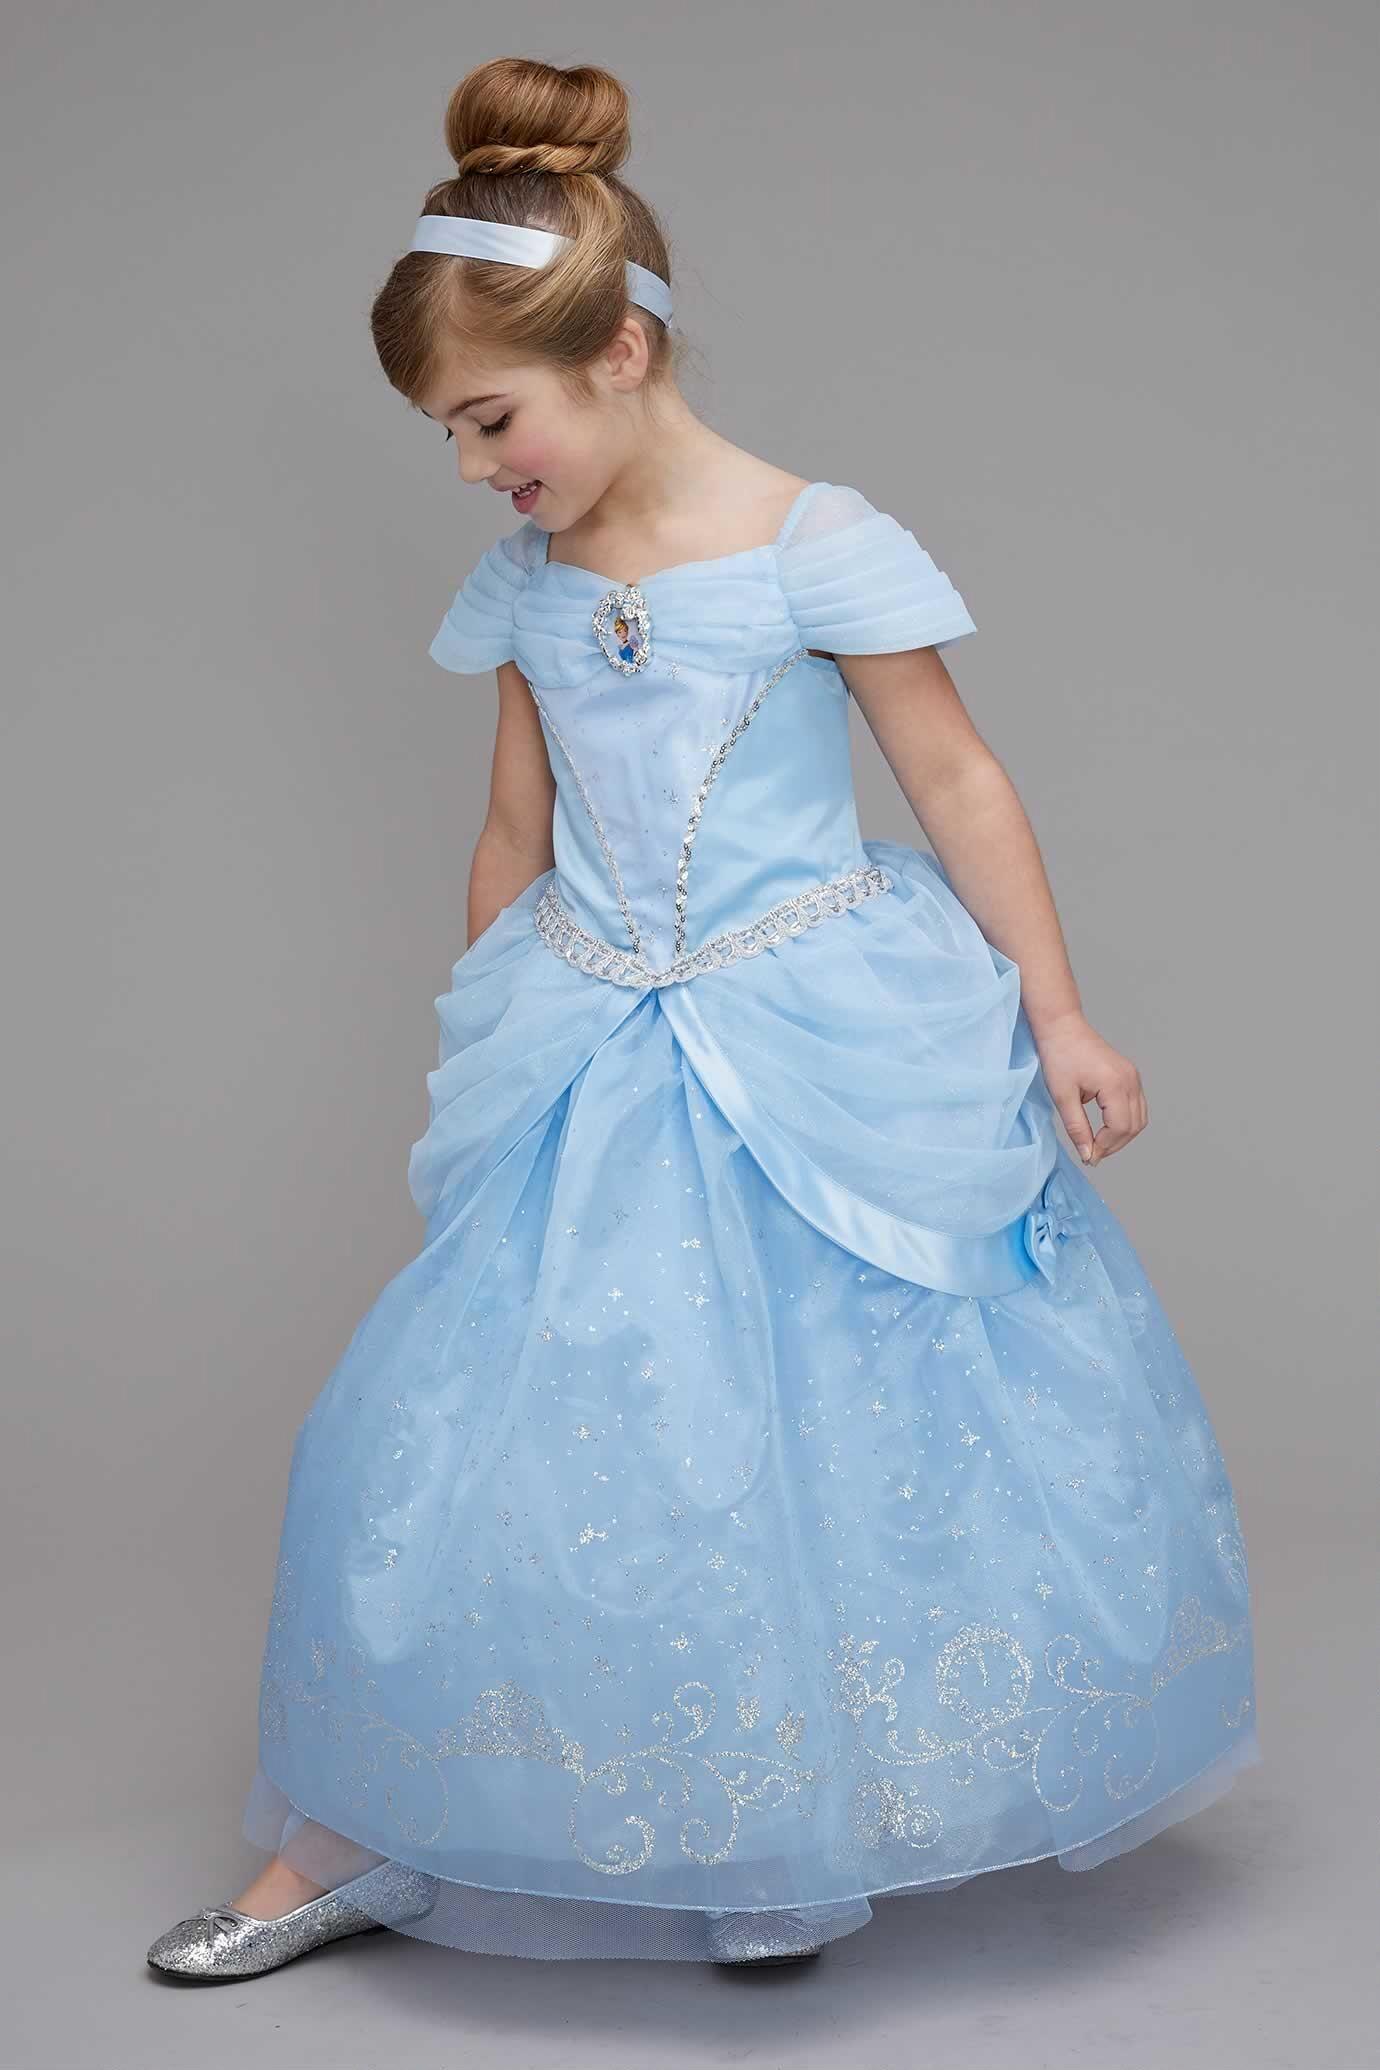 87148bb87c64c Cinderella Costume for Girls in 2019 | Grandkids Halloween costume ...